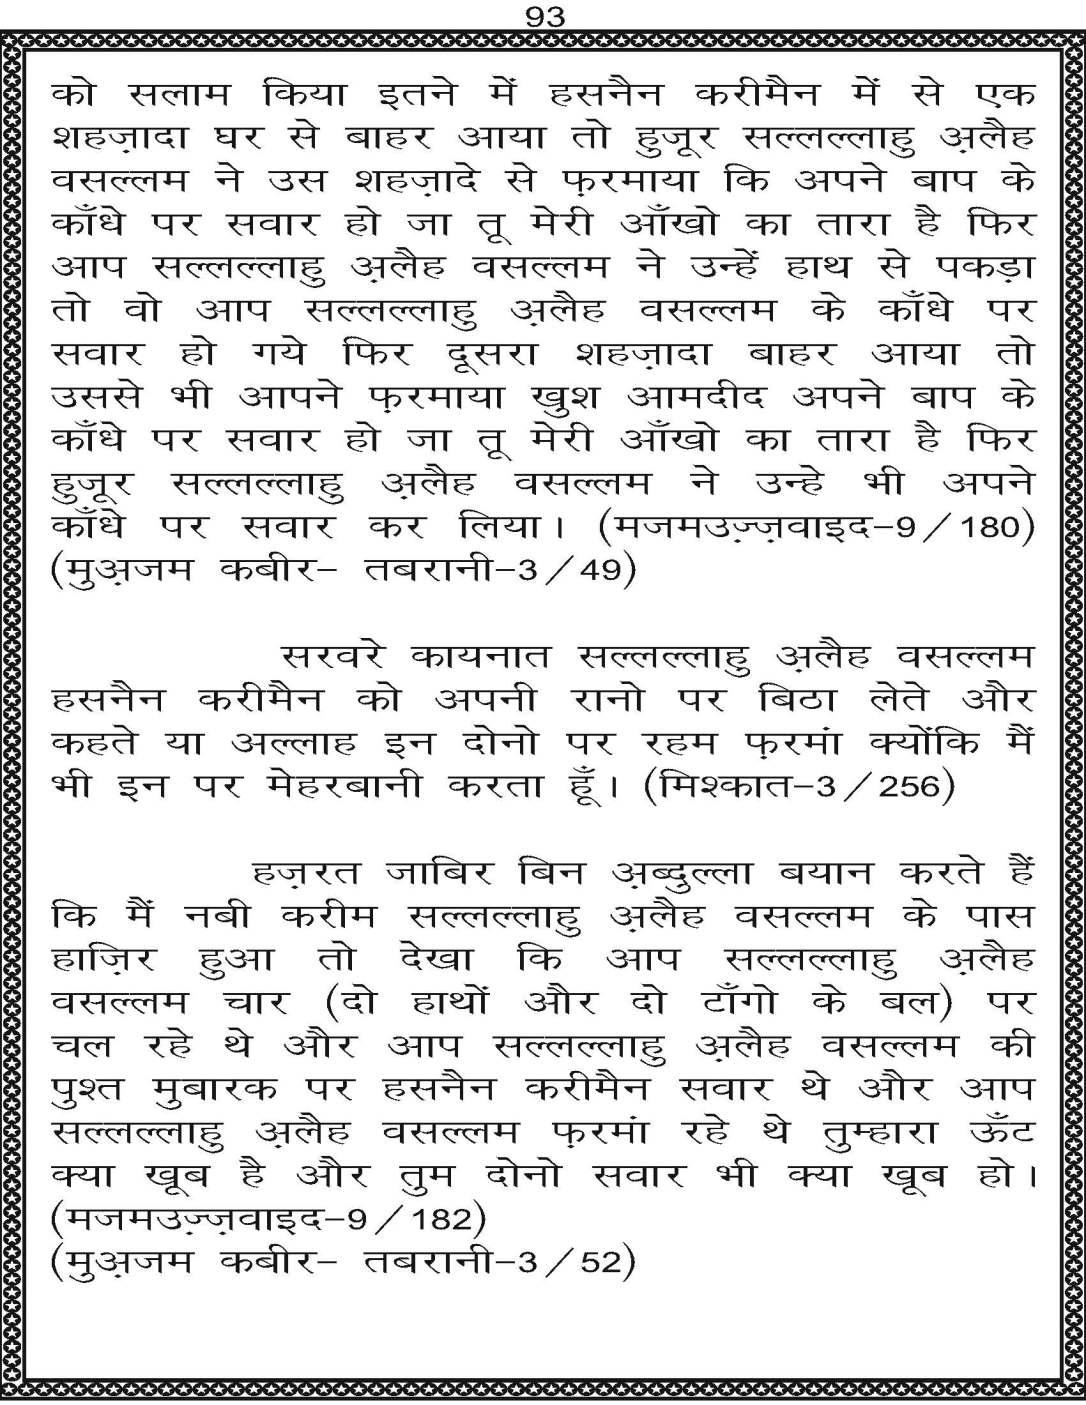 AzmateTaziyadari_Page_093